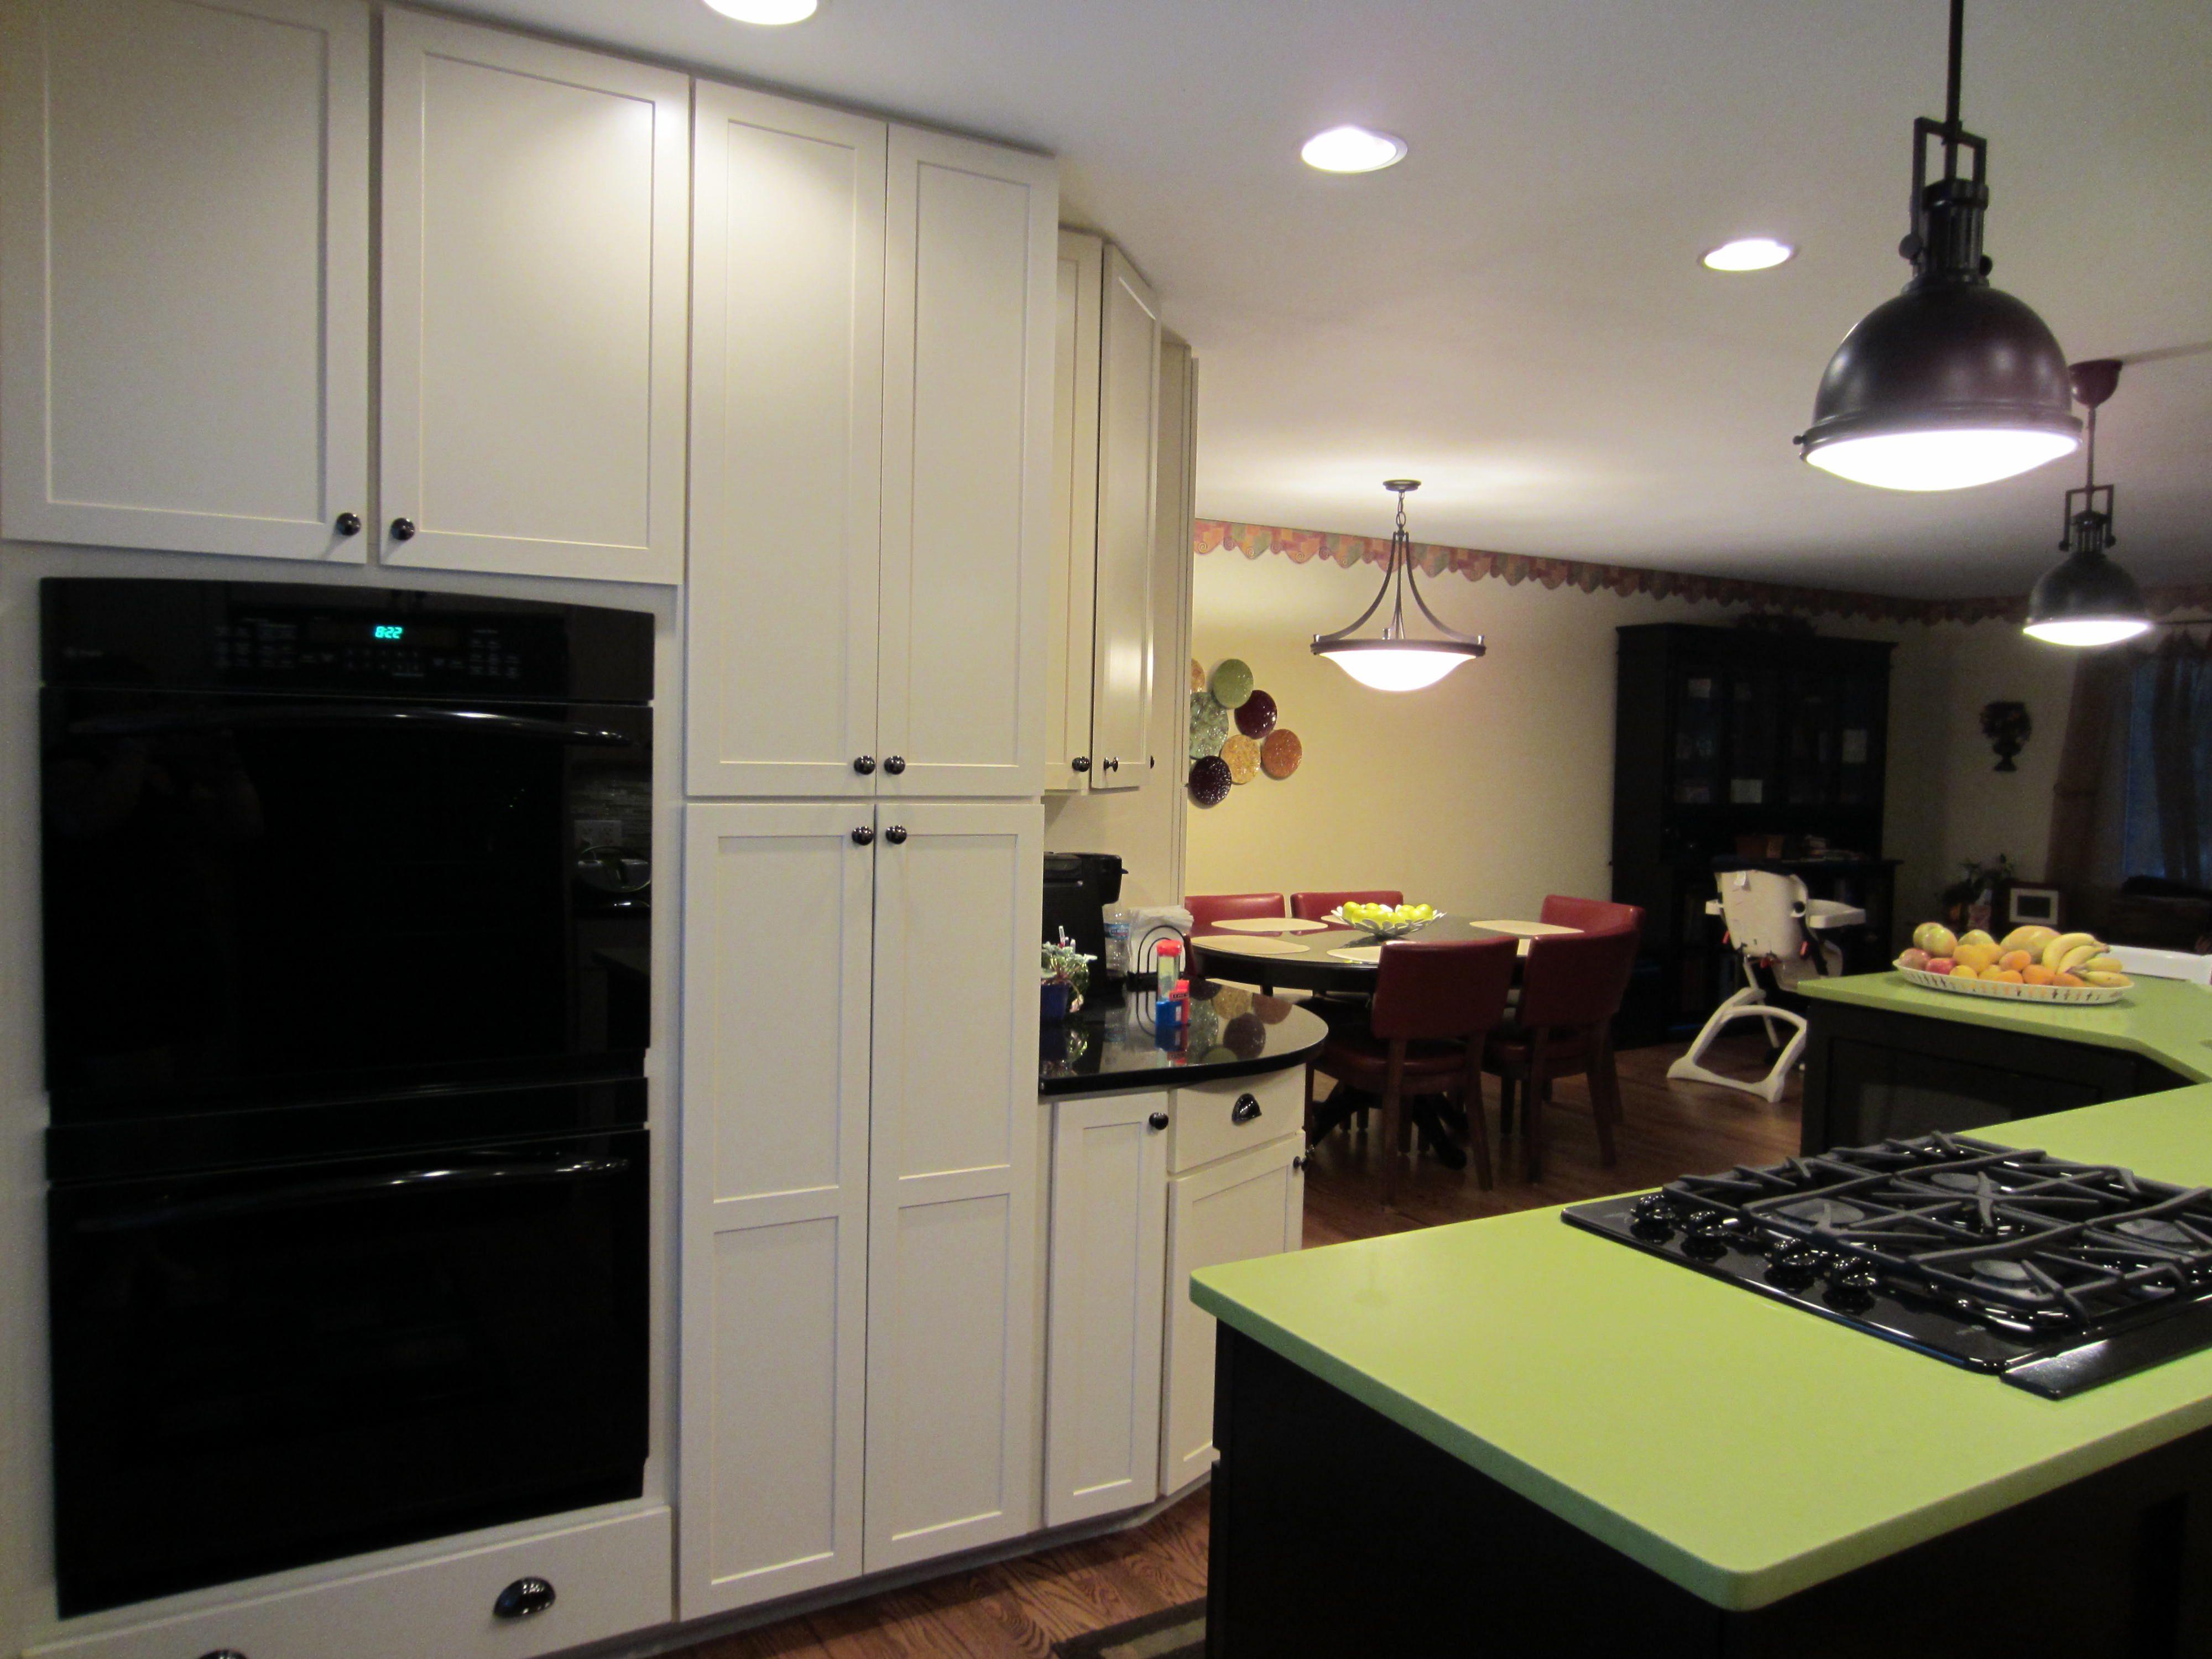 Apple Martini Green Quartz Counter Express Kitchen Bath Frankfort Il Kitchen Kitchen And Bath Kitchen Remodel